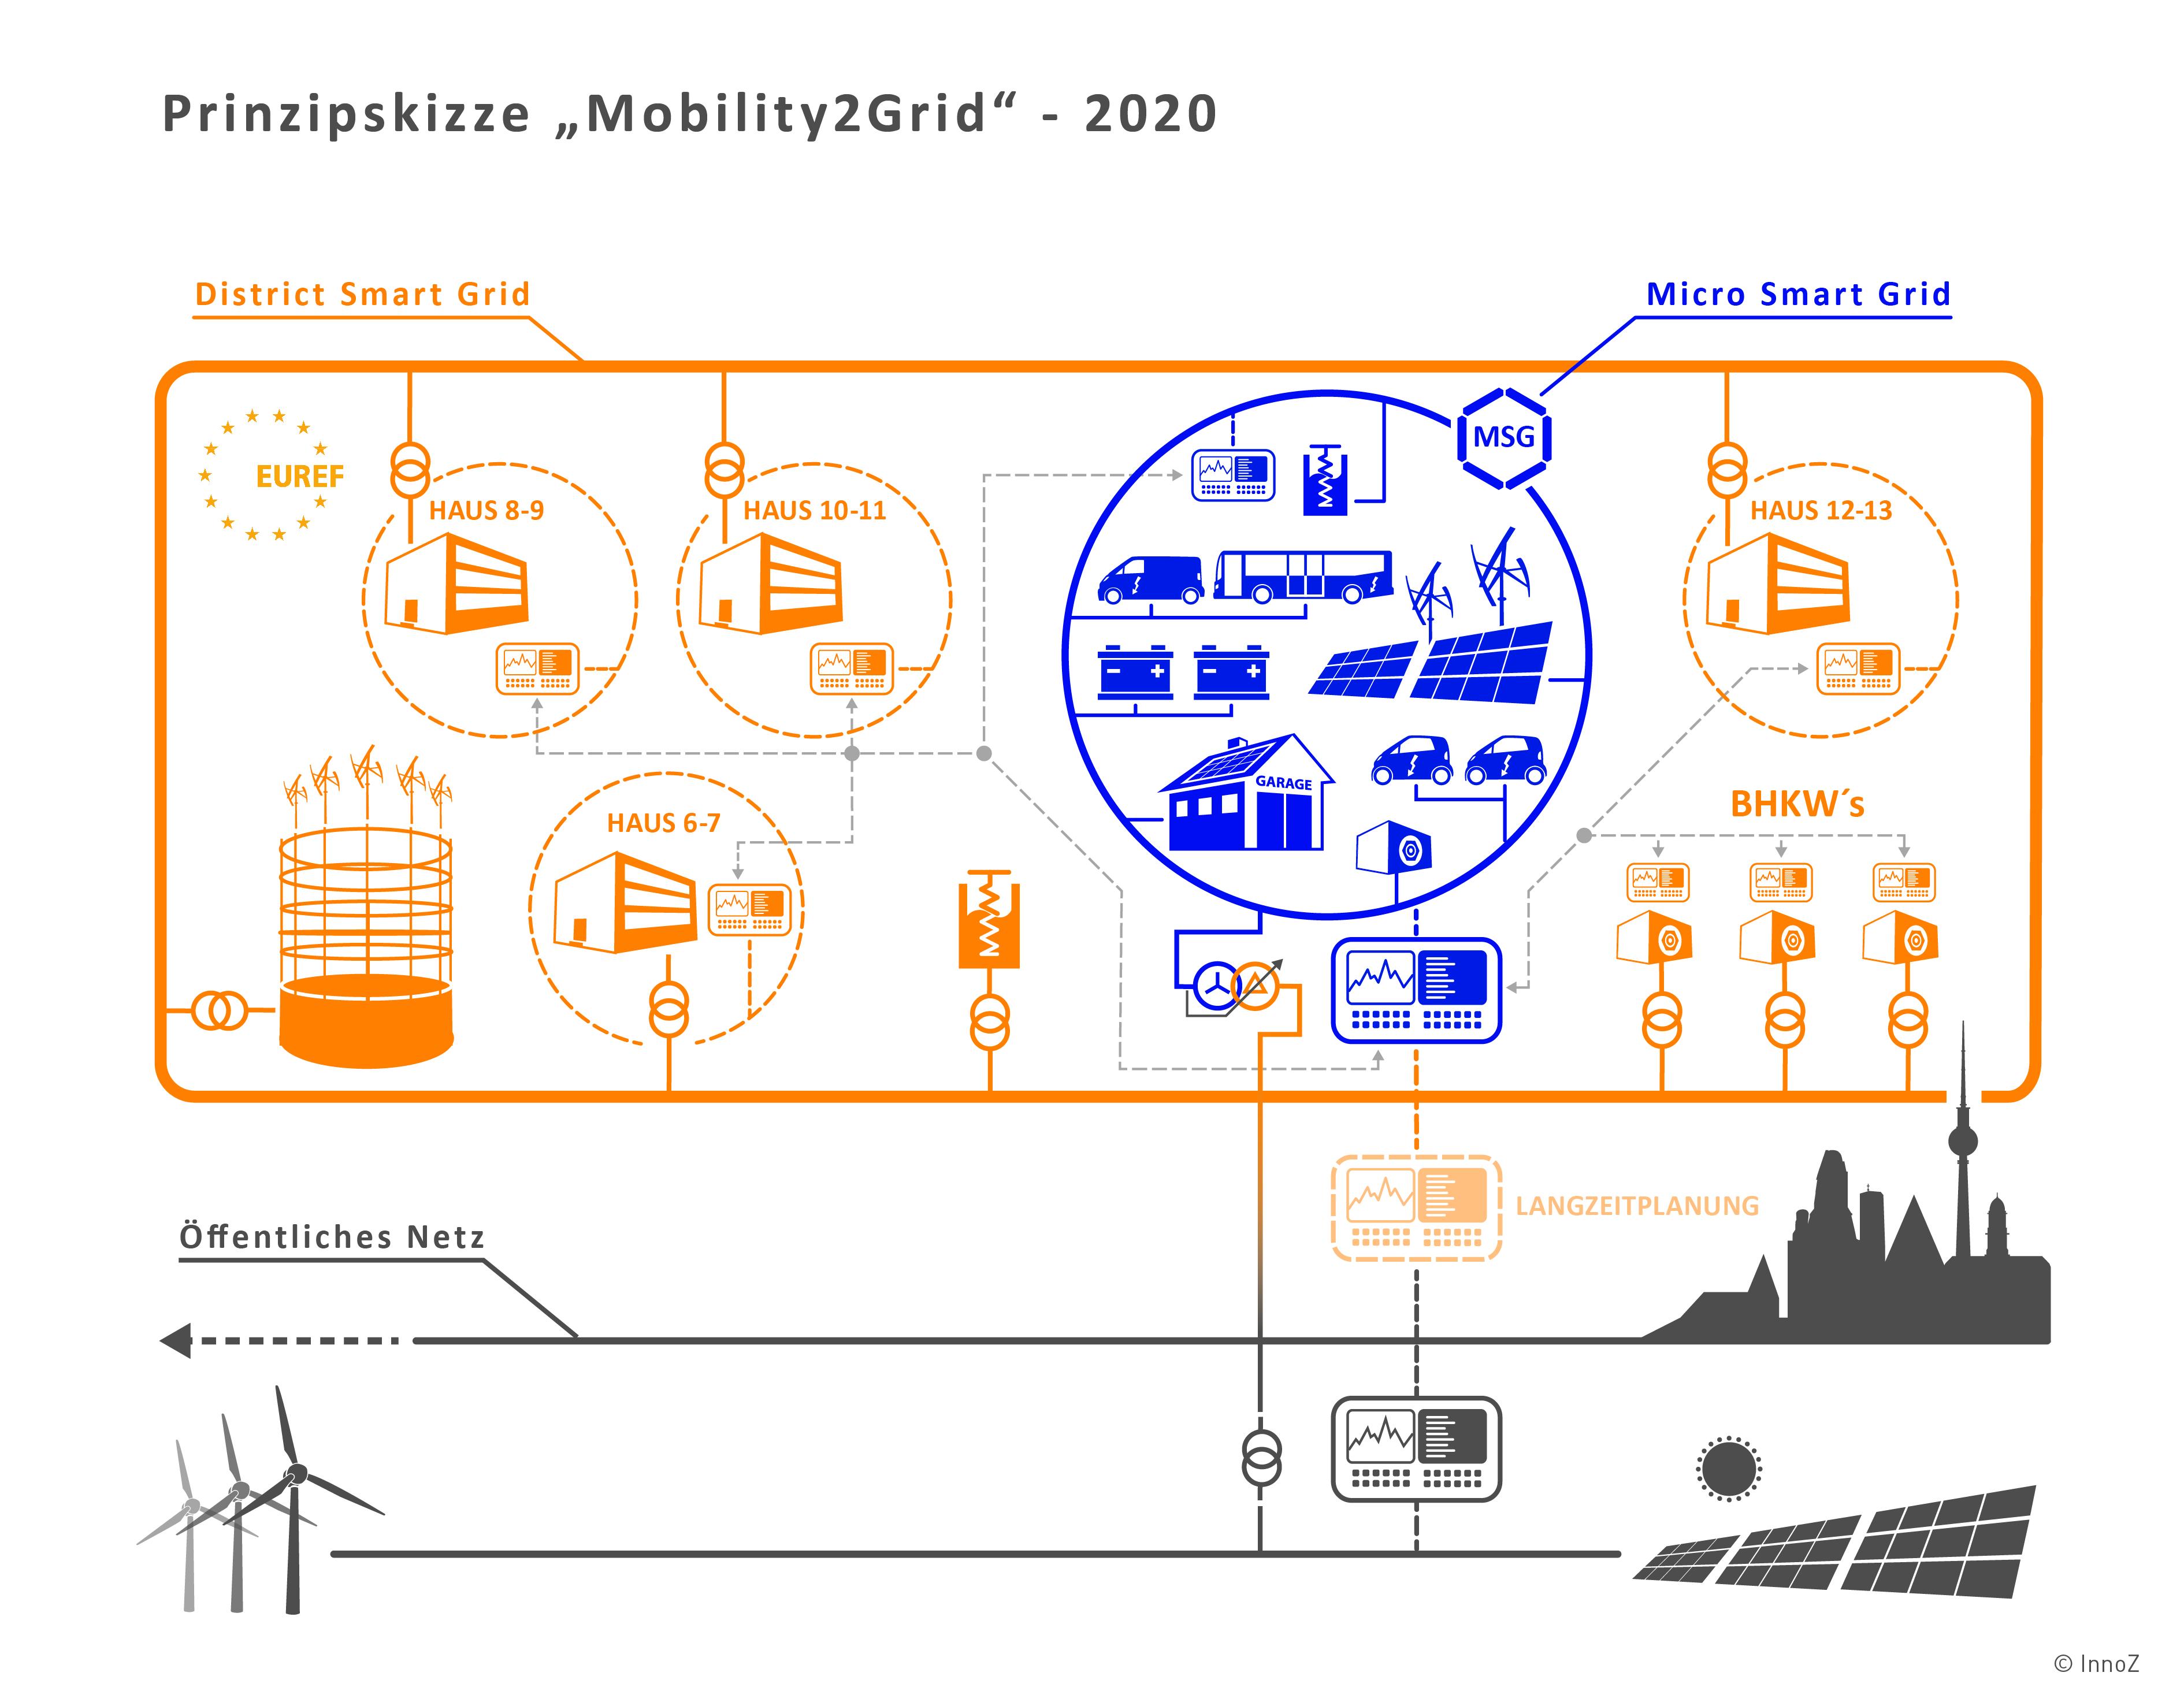 Prinzipskizze Mobilty2Grid 2020